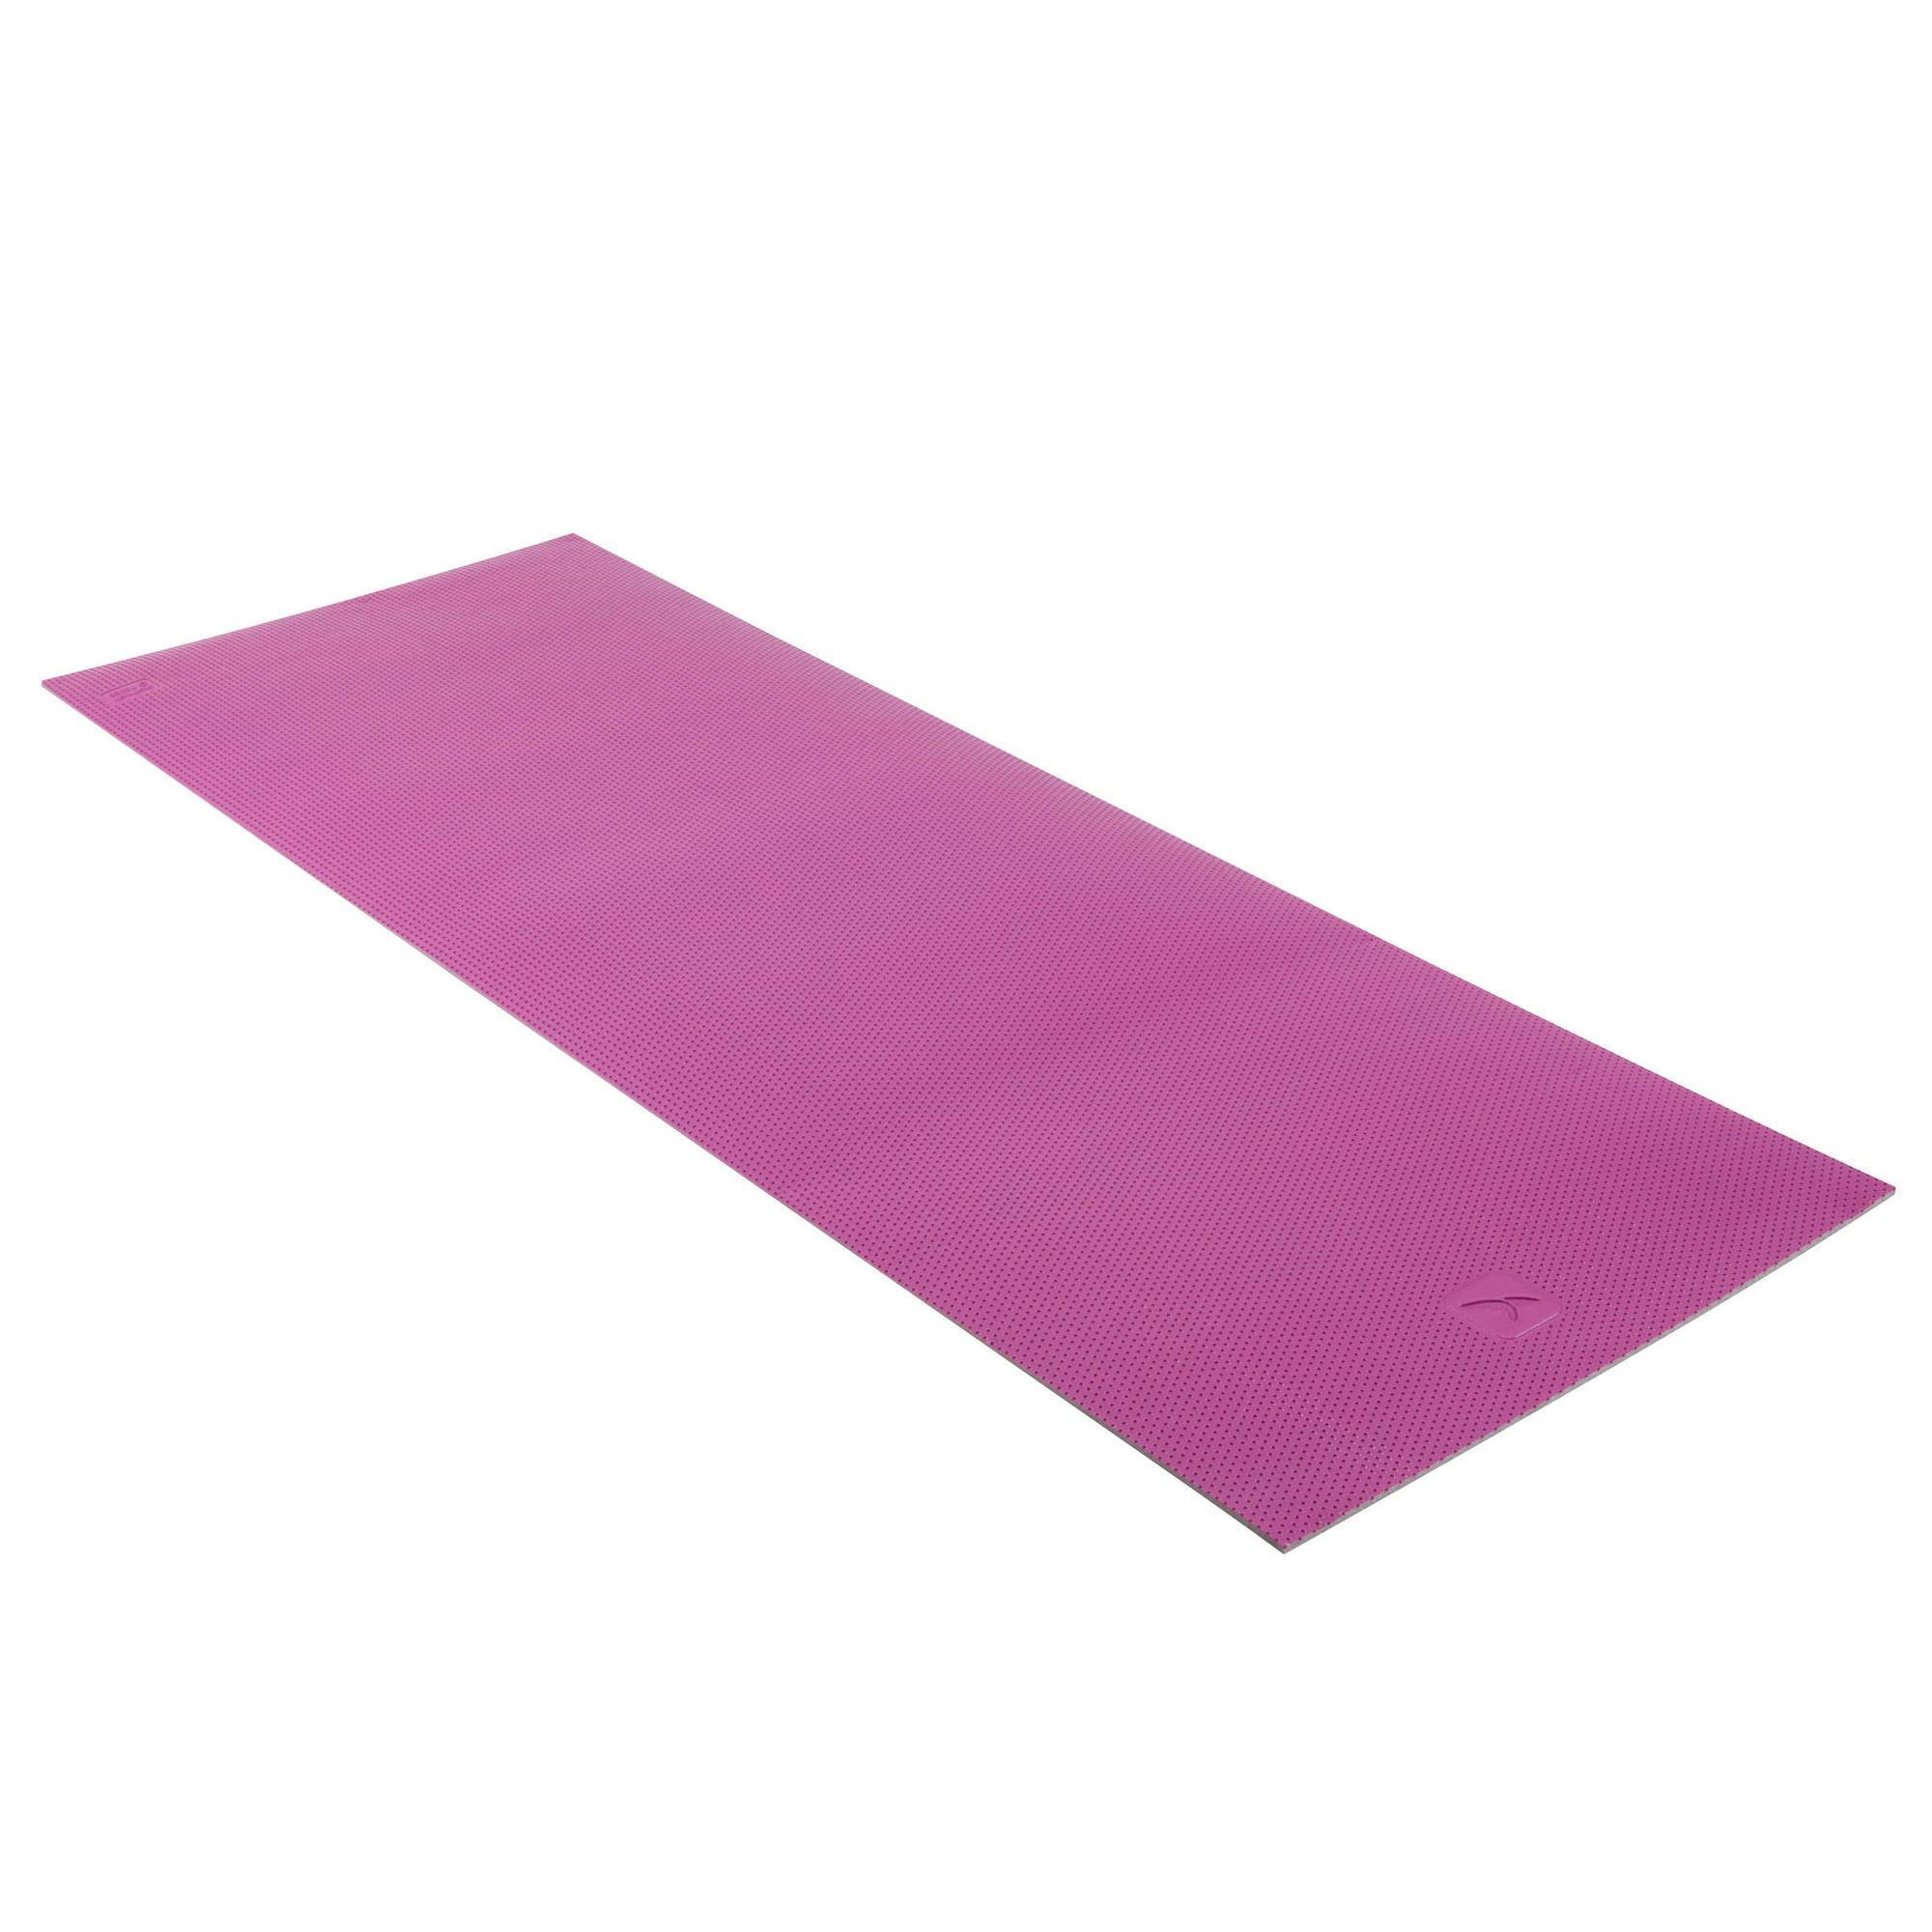 tapis gym pilates 500 rose 160 x 60 cm clubs. Black Bedroom Furniture Sets. Home Design Ideas